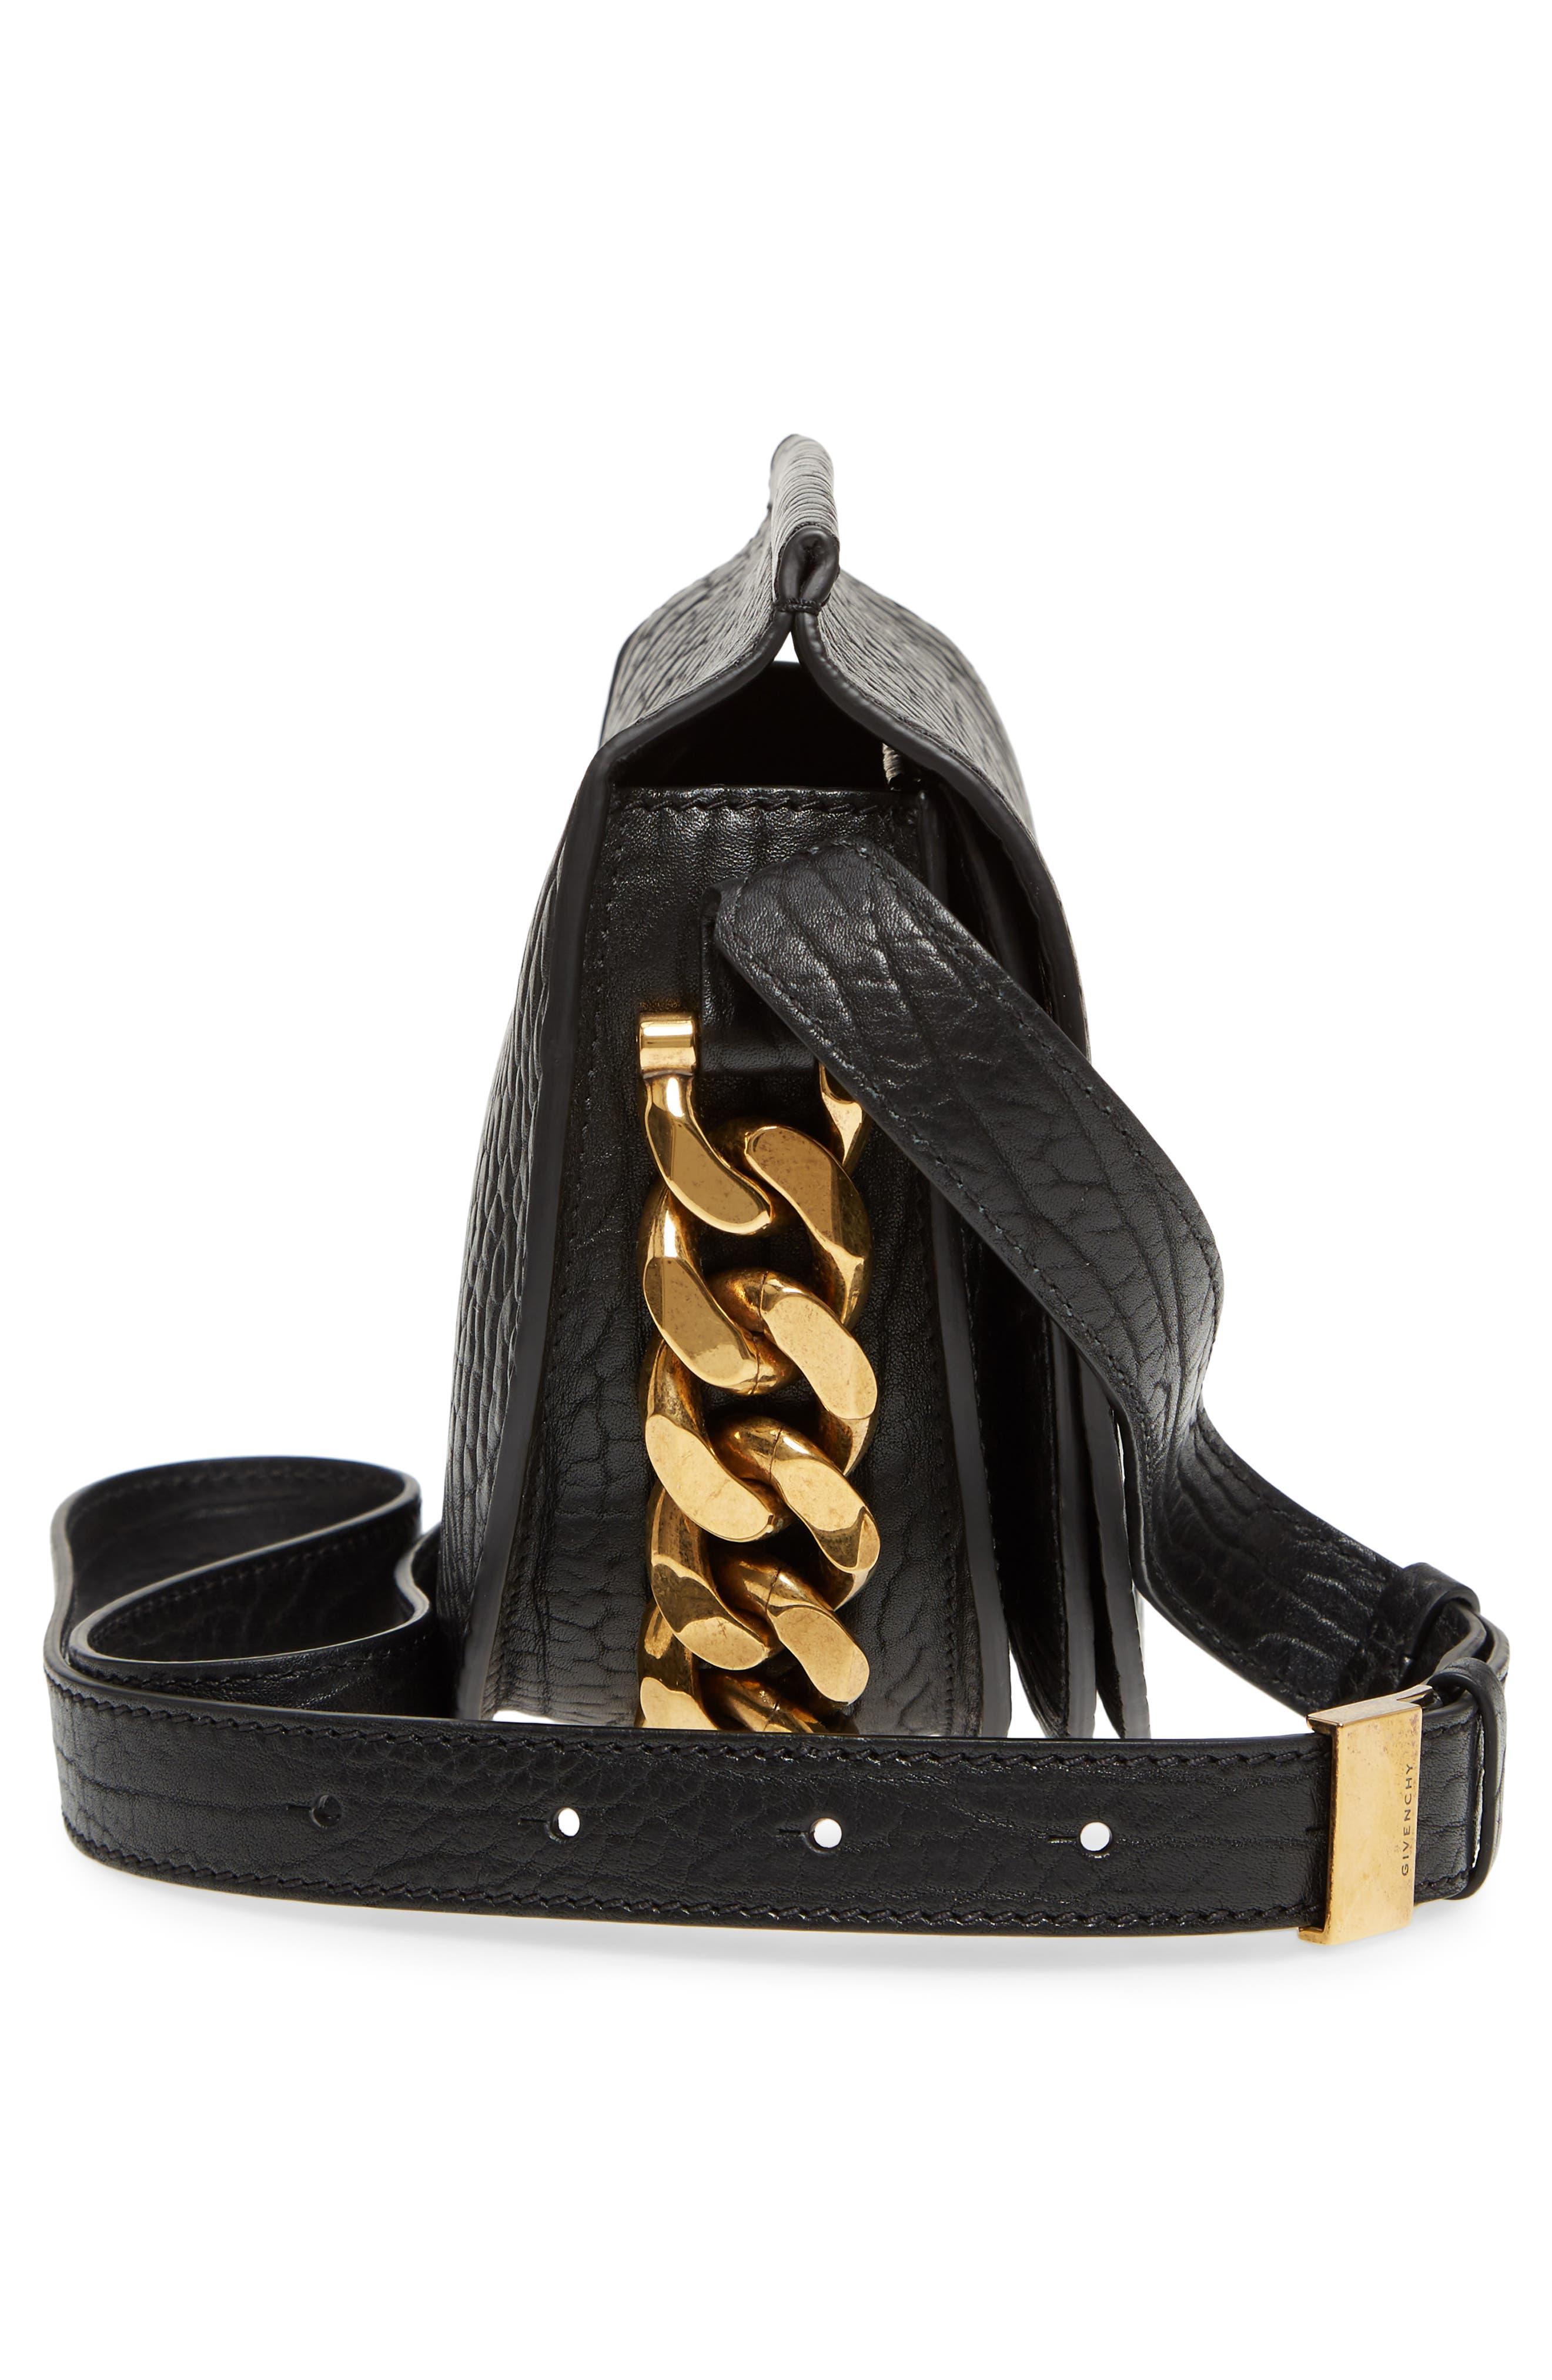 Infinity Calfskin Leather Saddle Bag,                             Alternate thumbnail 5, color,                             Black